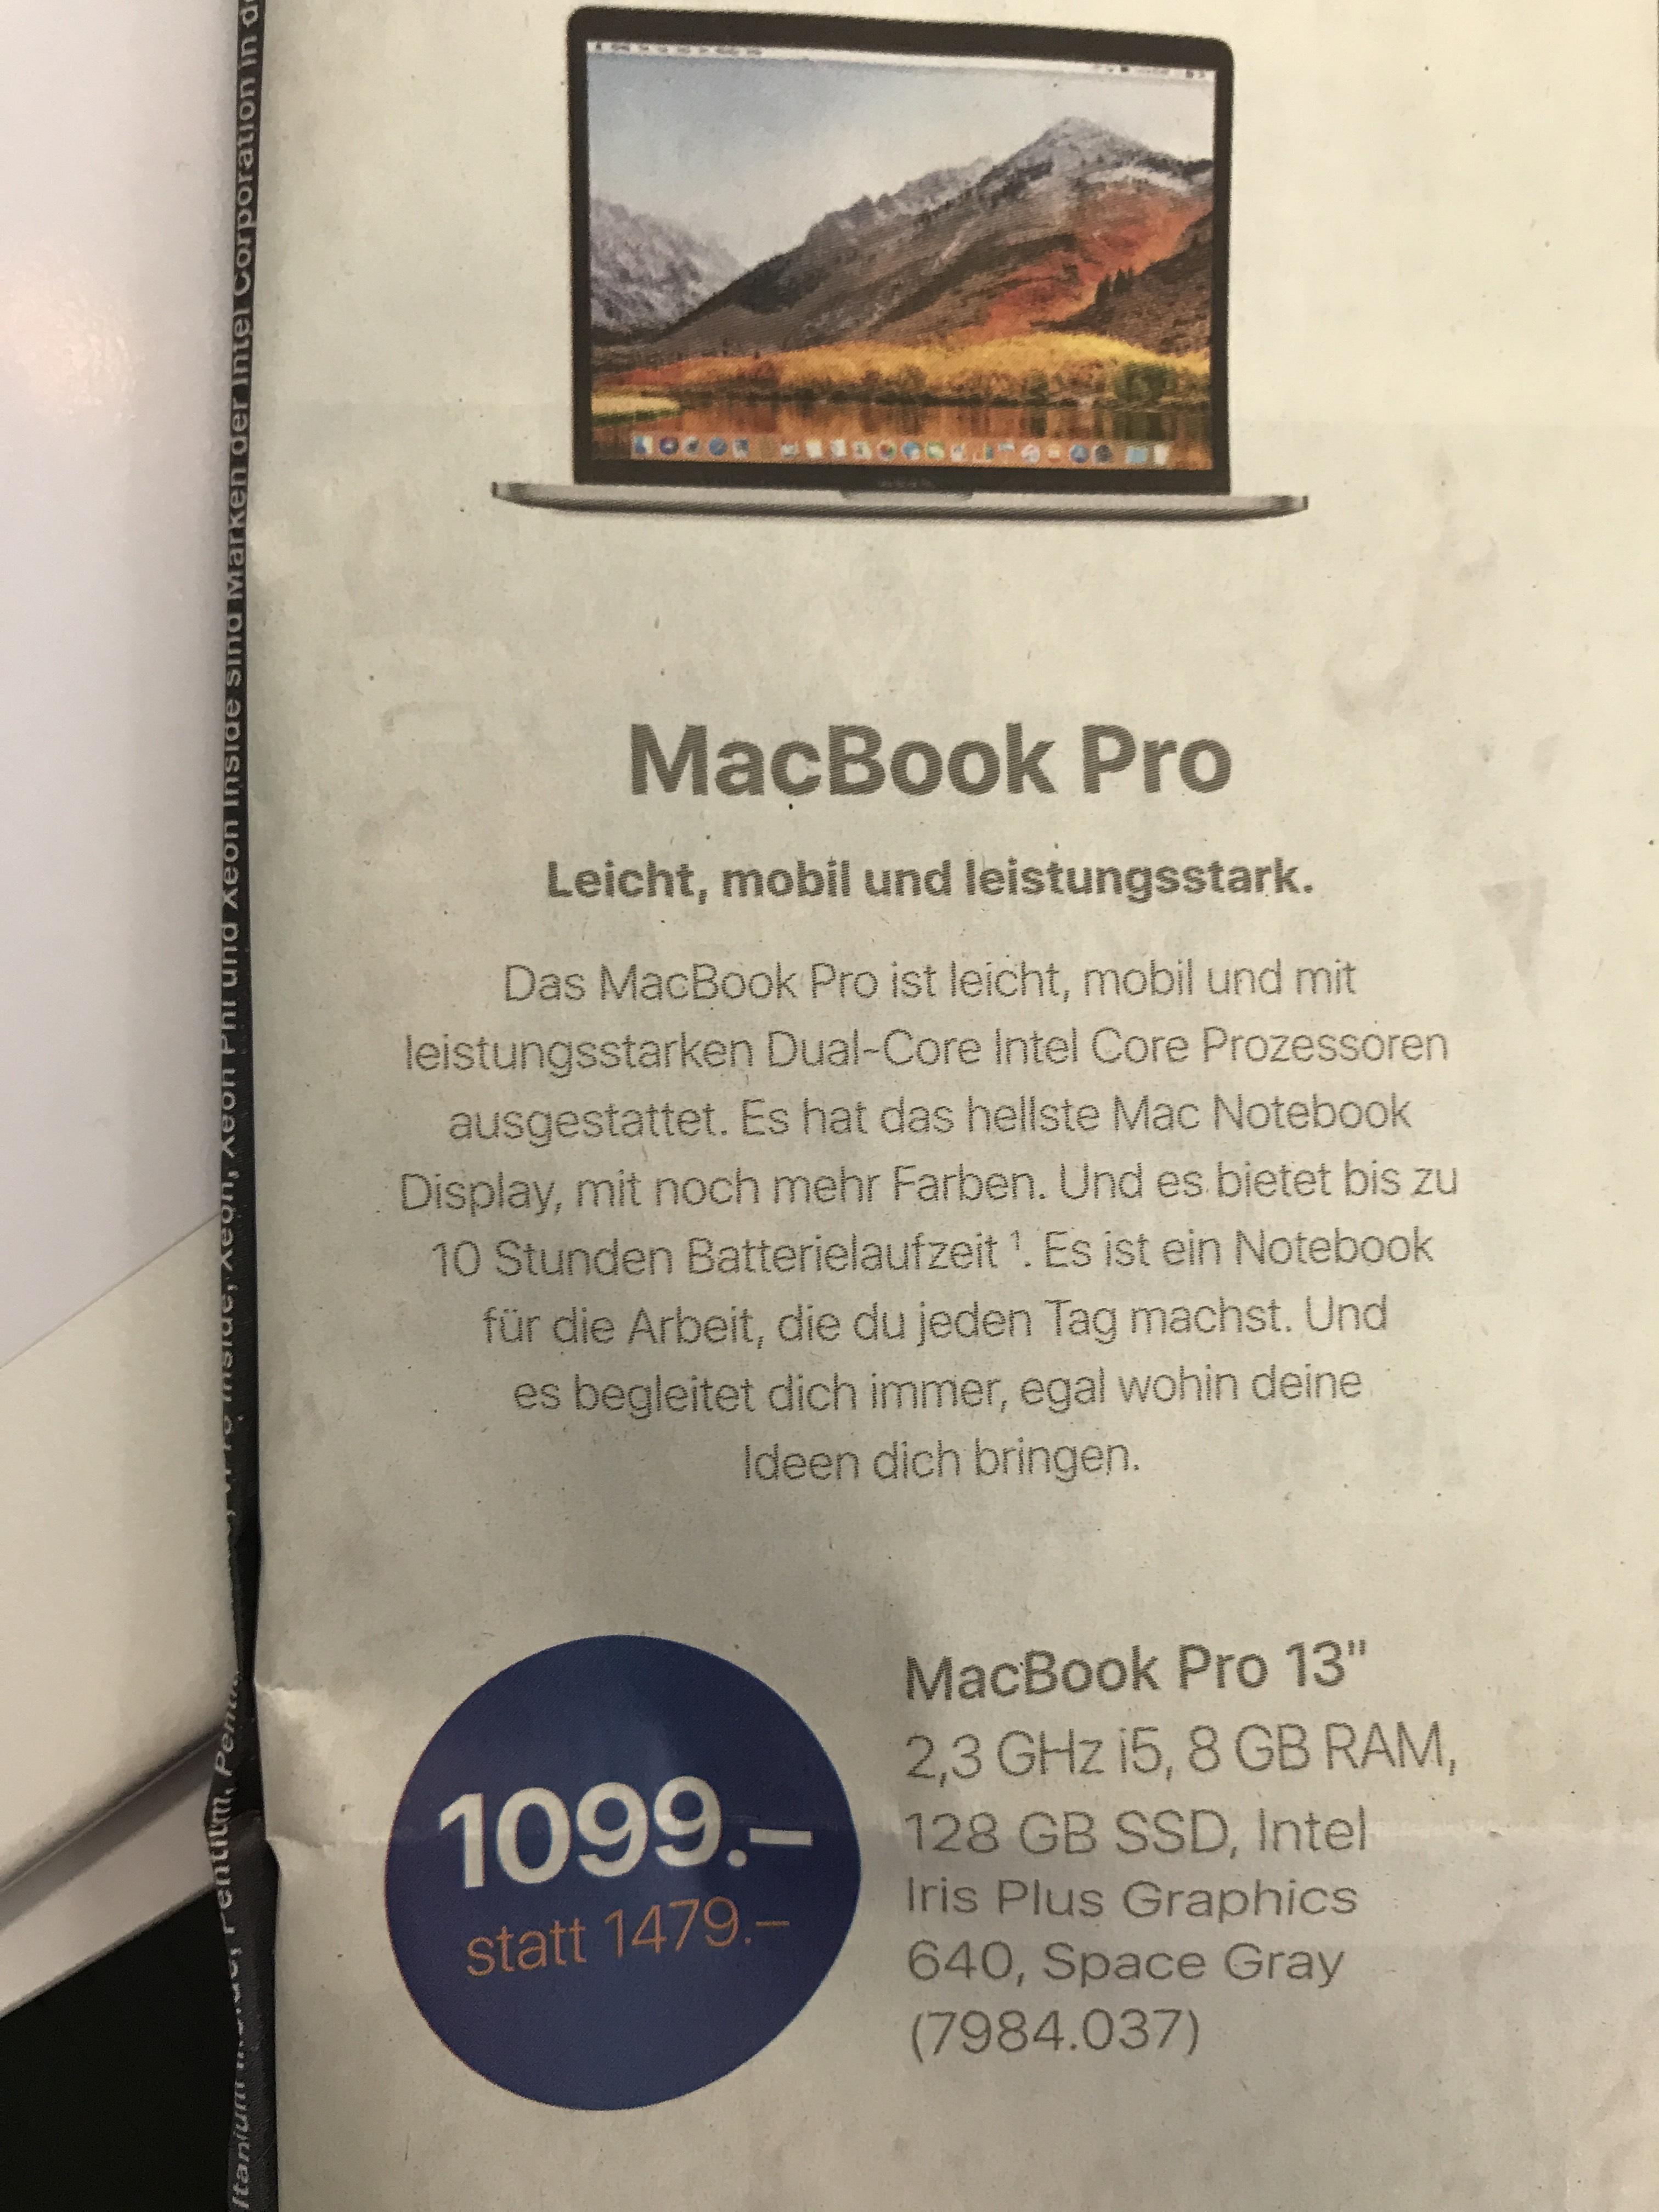 "*Schweiz* MacBook Pro Retina 13"" 128 GB SSD"